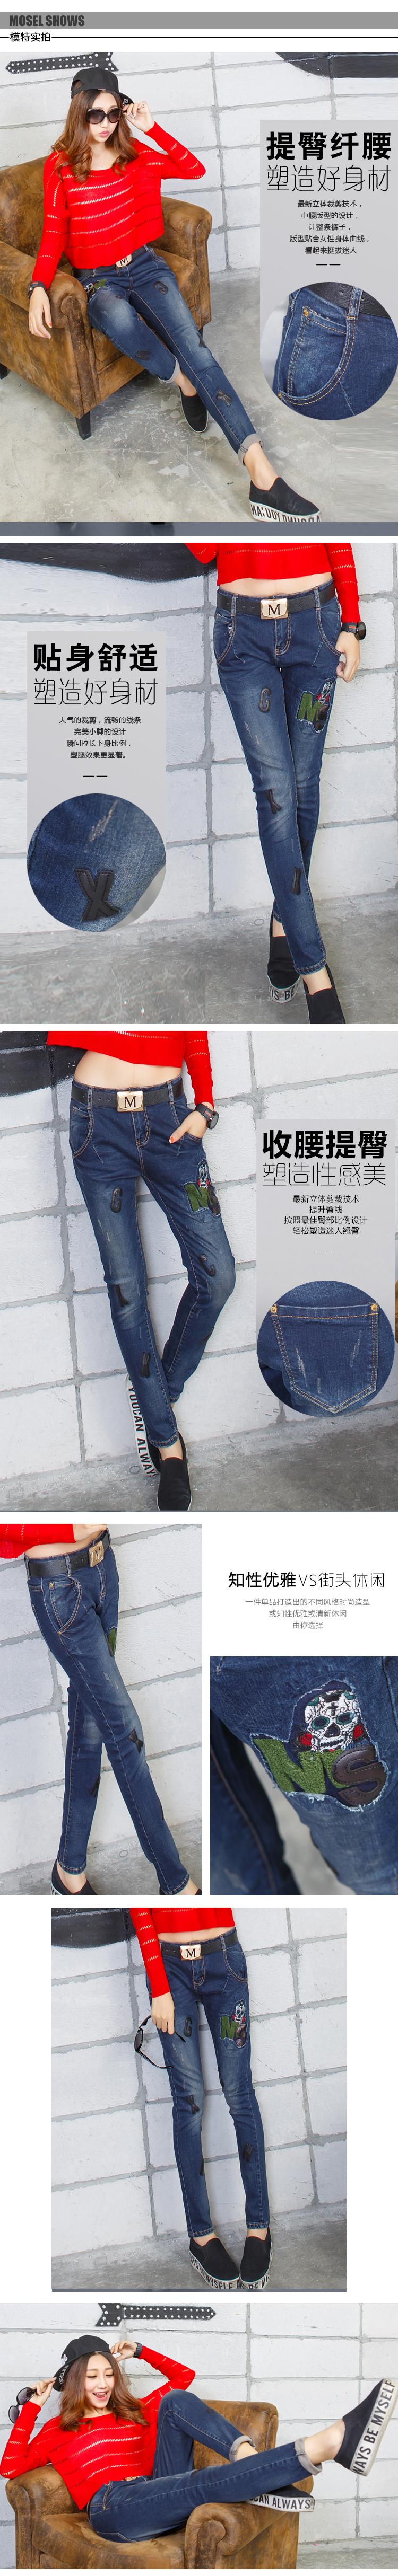 Скидки на 2016 кружева джинсы женские брюки новые брюки карандаш джинсы с дырками vaqueros mujer жан femme